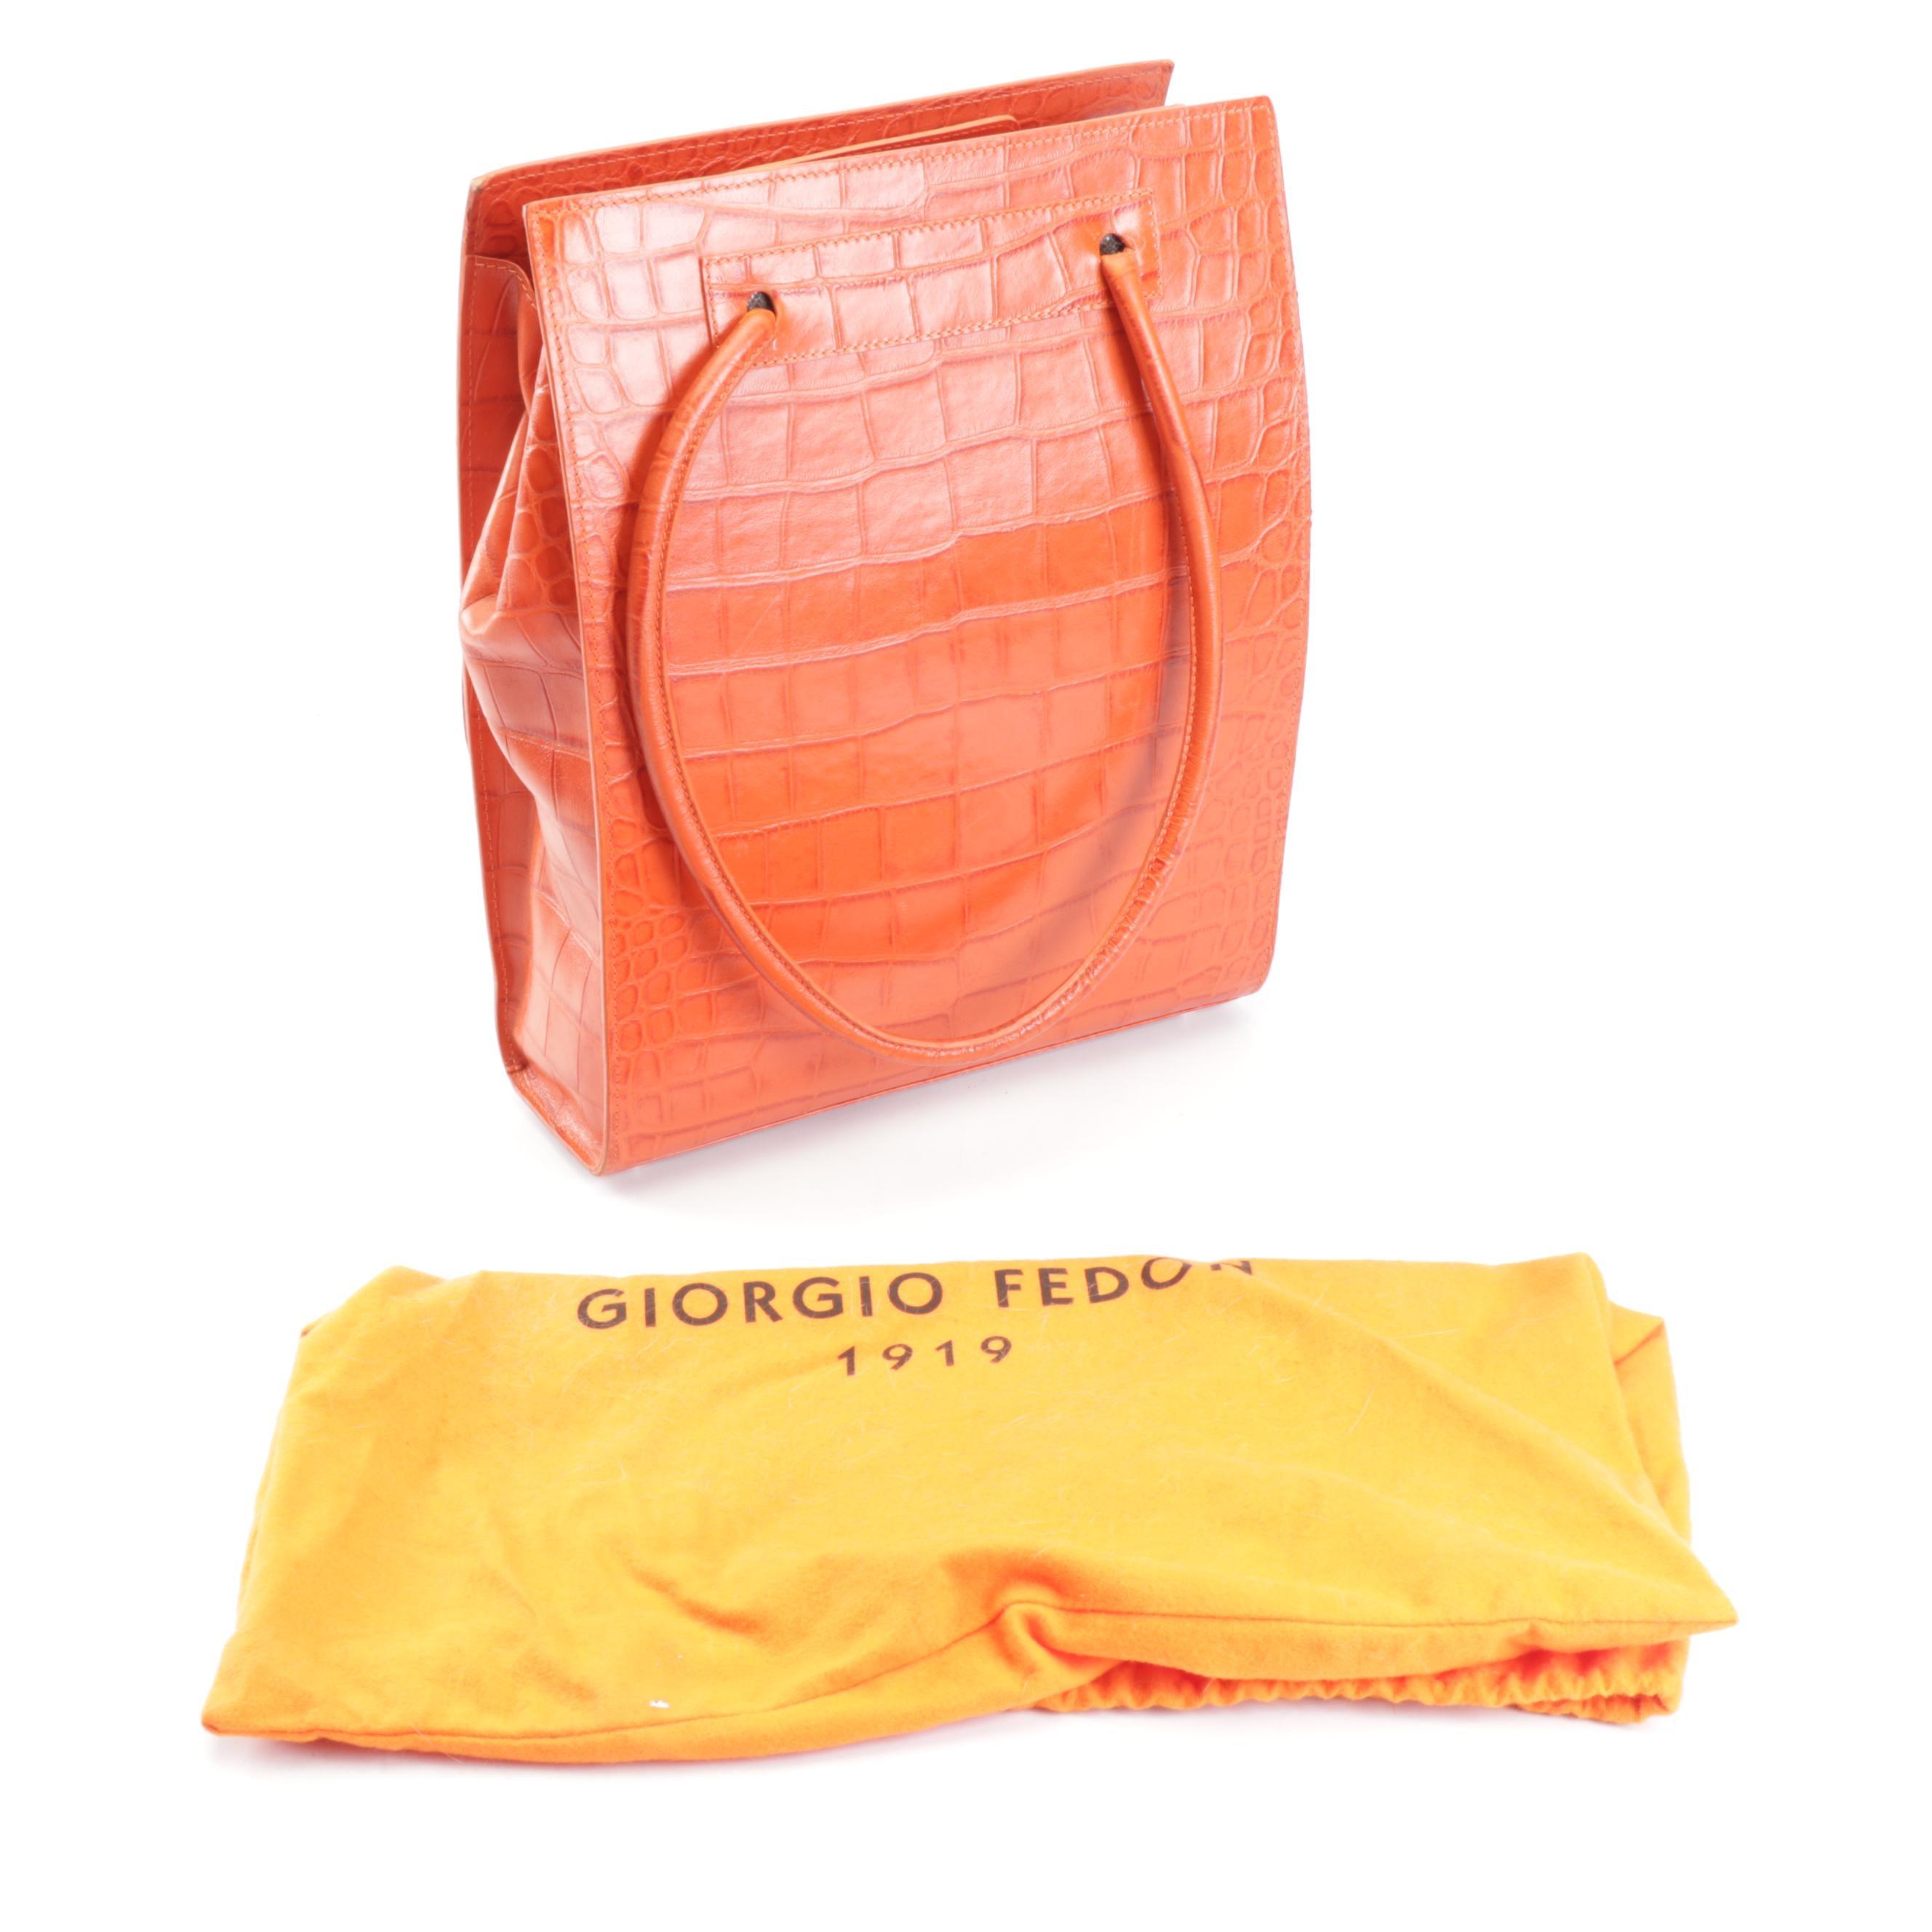 Giorgio Fedon 1919 Croc Embossed Orange Leather Shoulder Bag